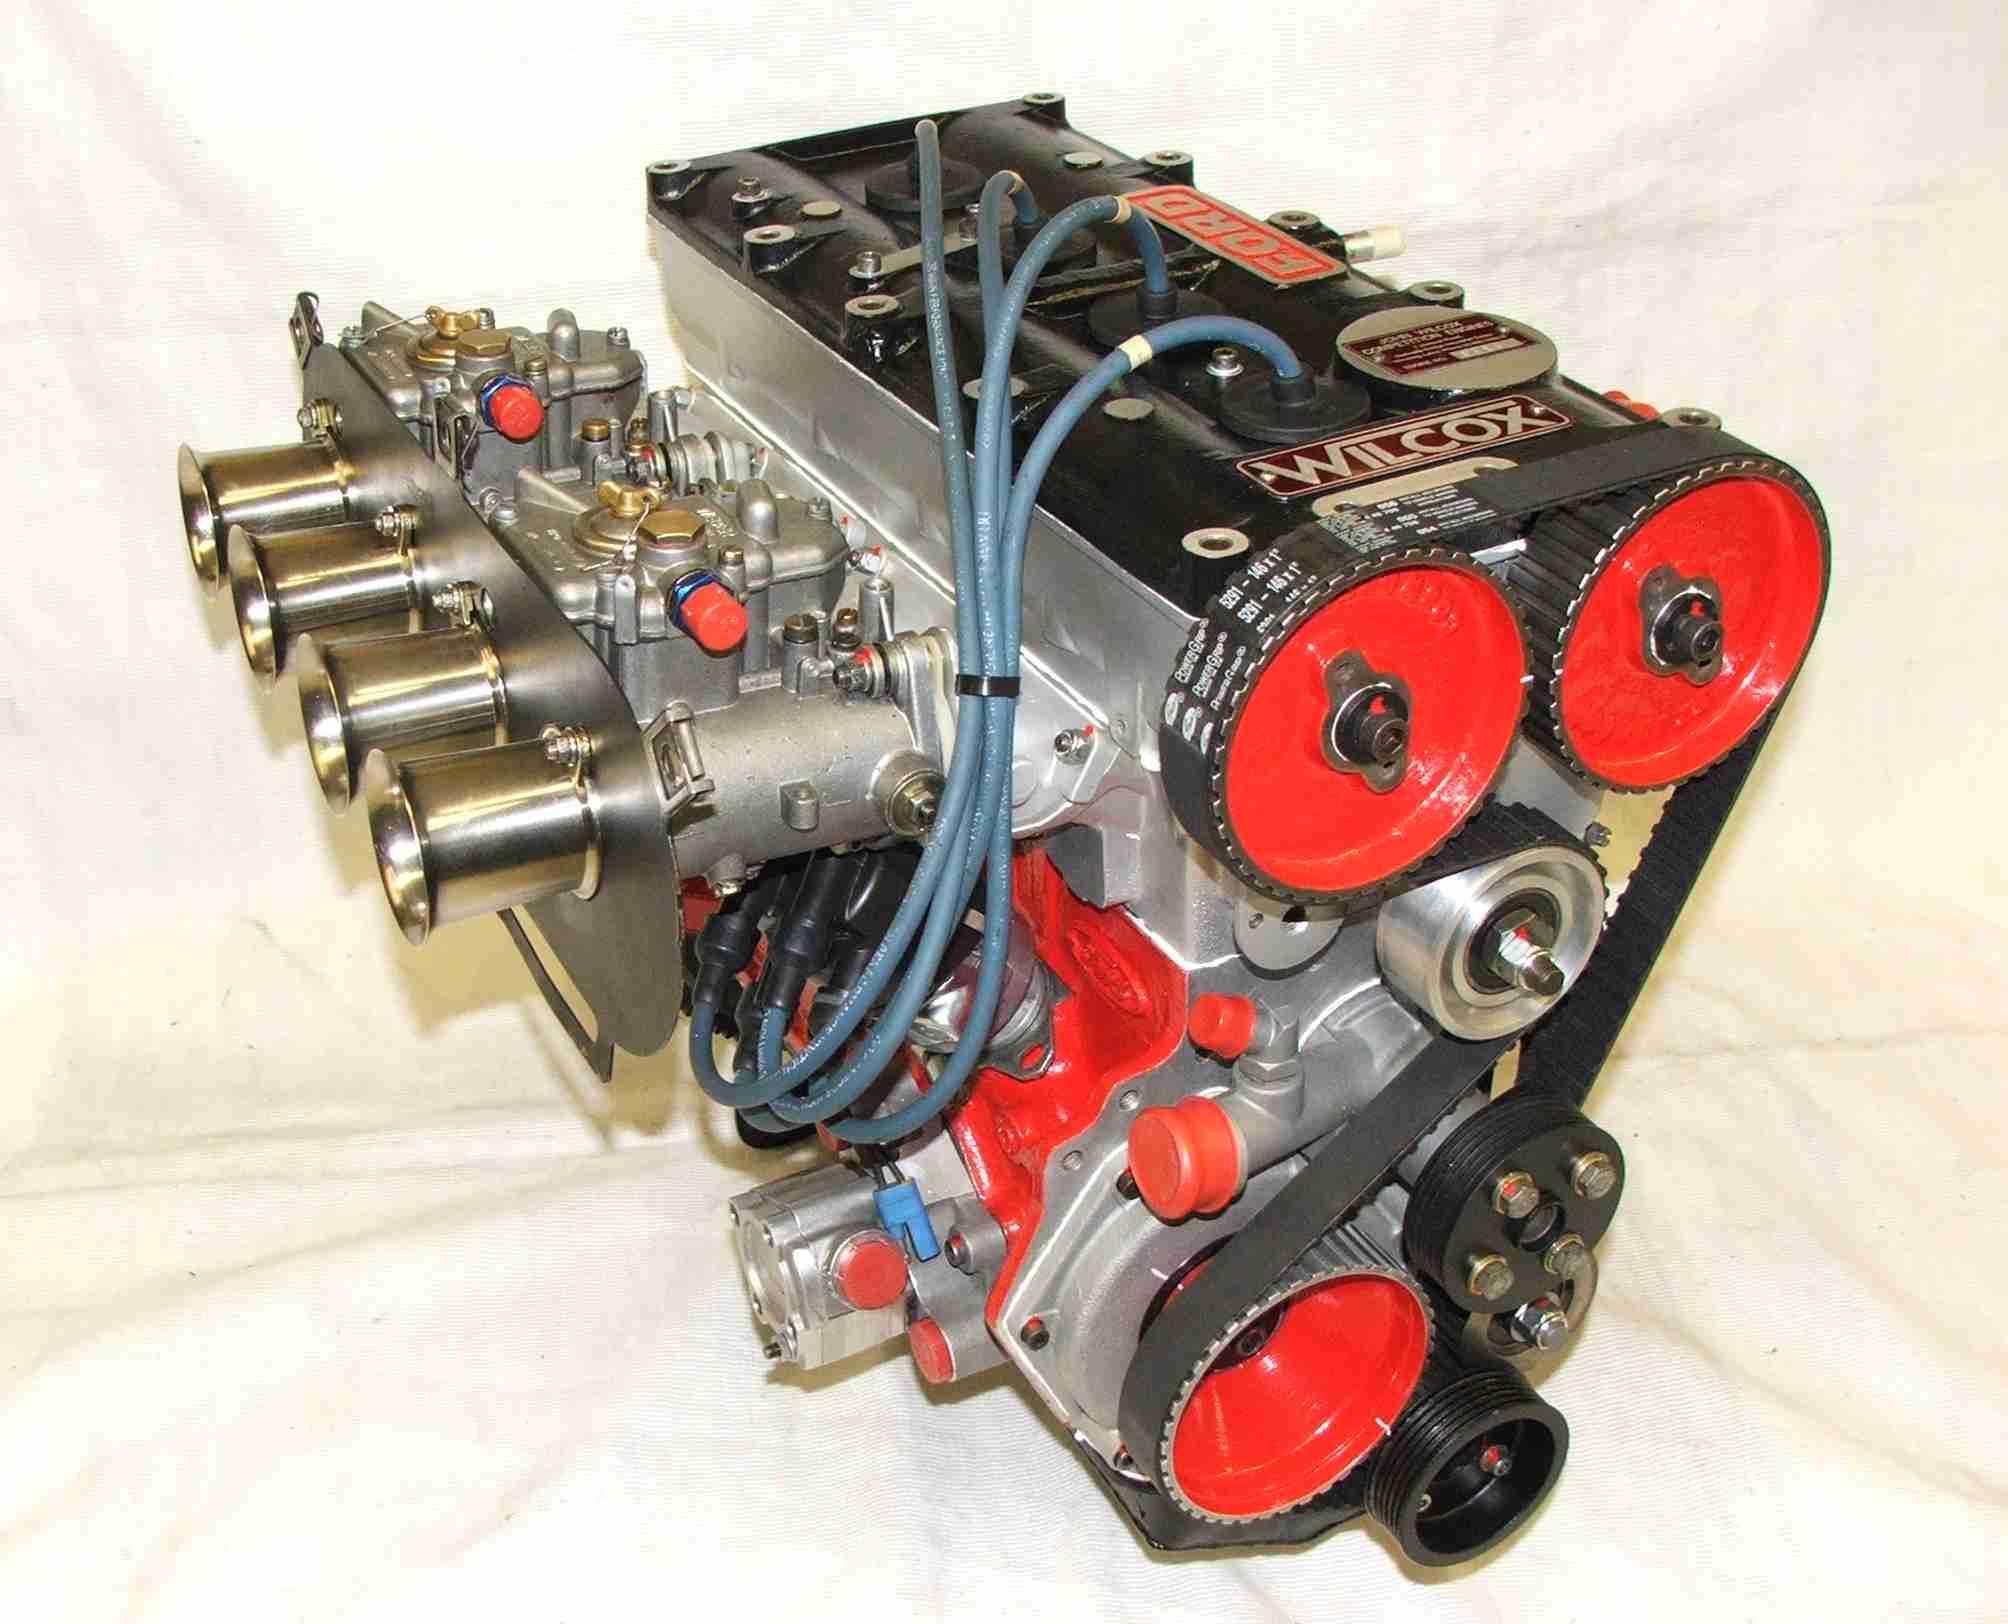 2 2 liter cosworth bdg mechanical beauty race engines. Black Bedroom Furniture Sets. Home Design Ideas